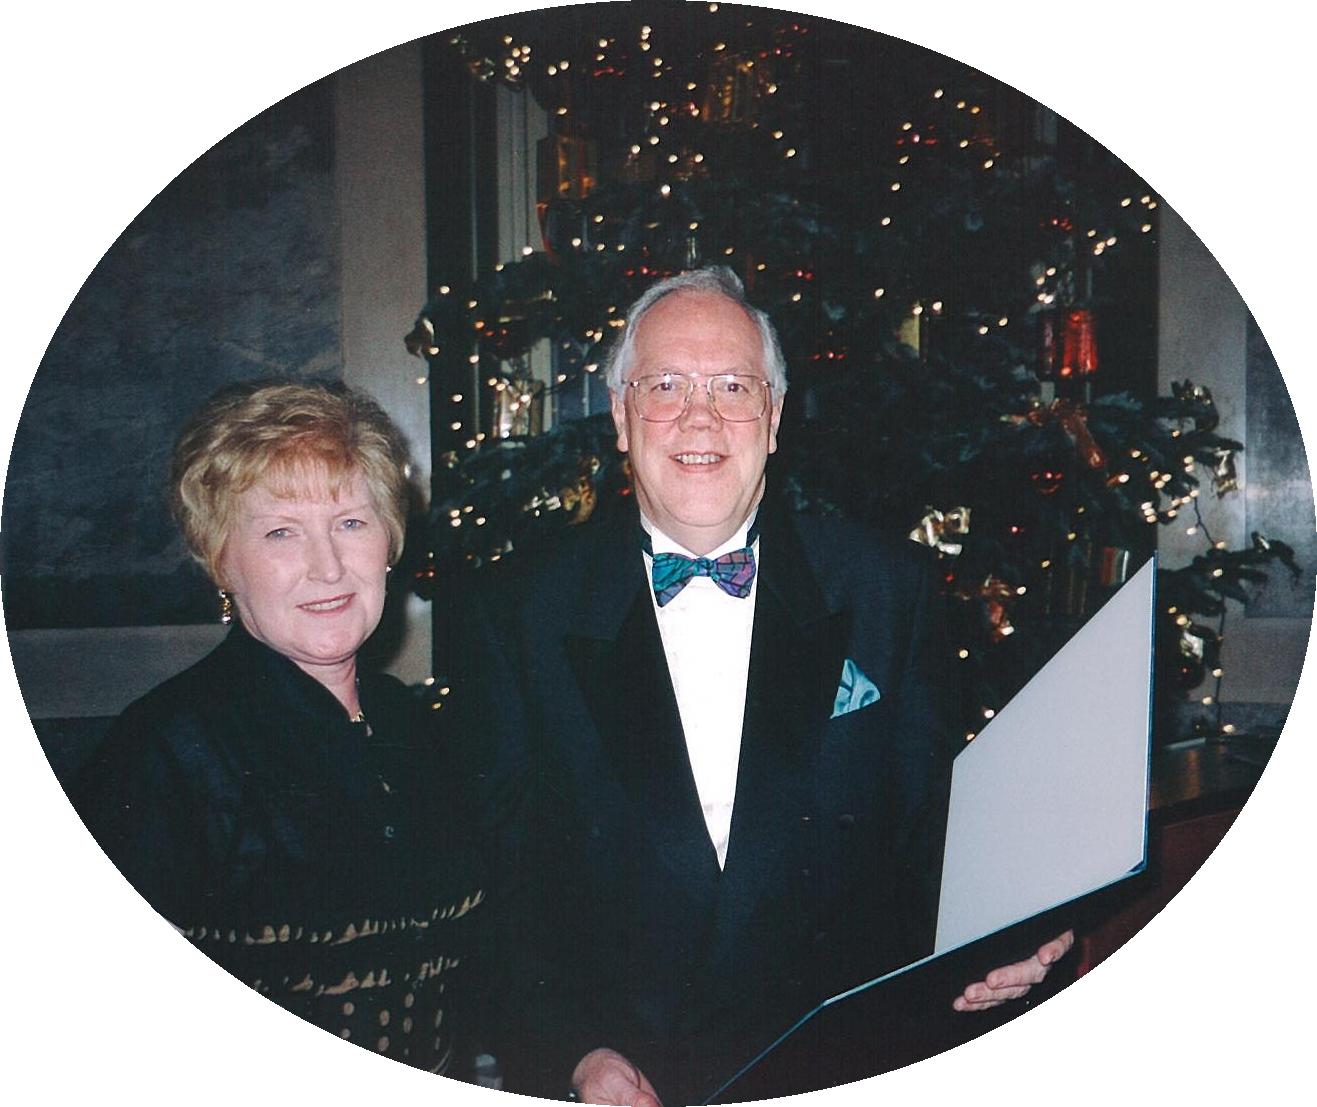 Elaine & Andrew Presentation in Vienna Award For Excellence in Design 2003.jpg